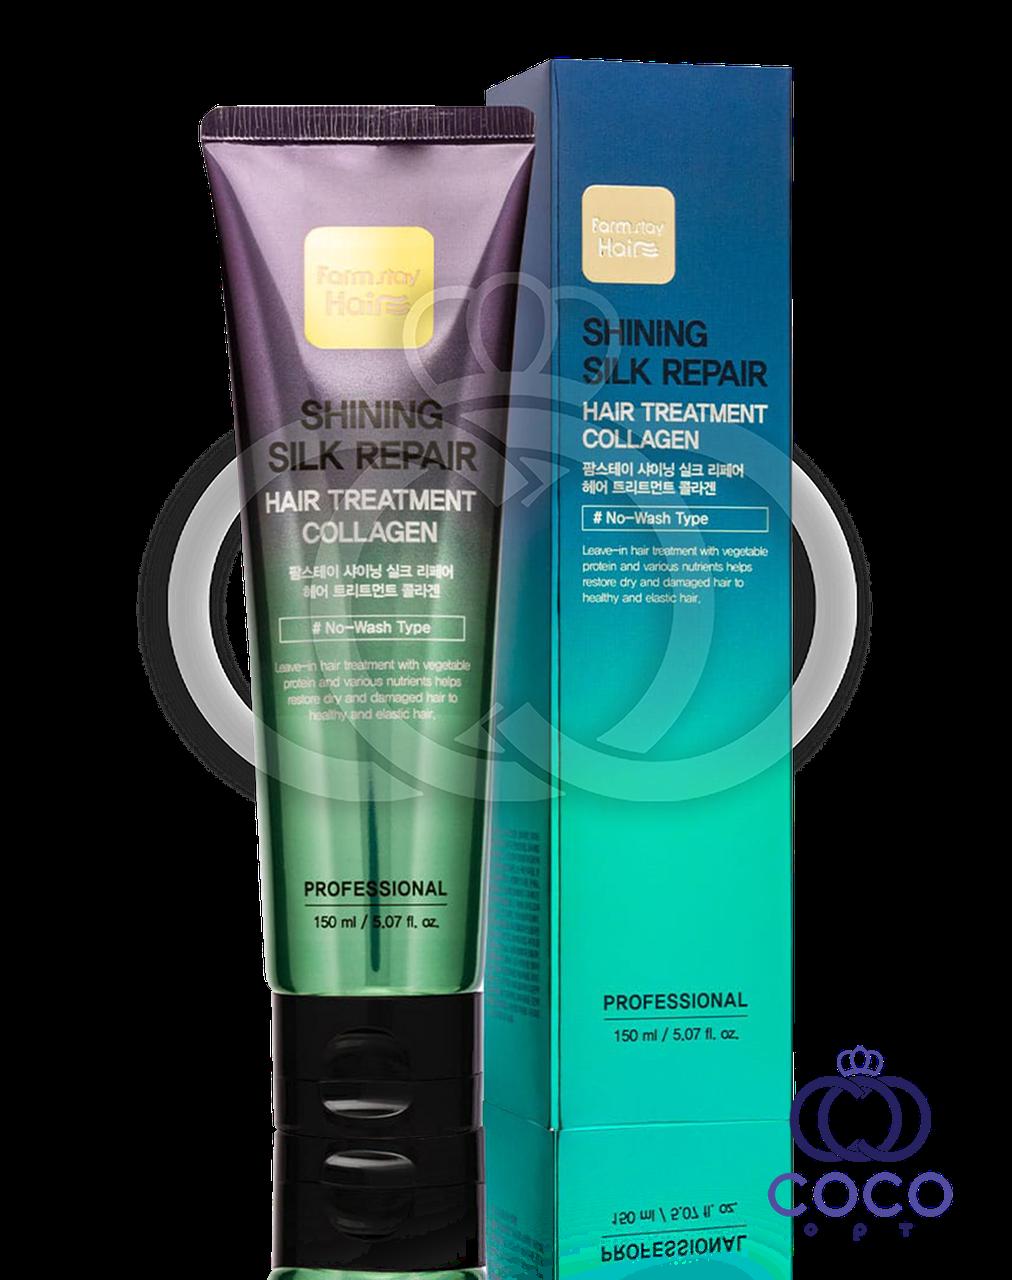 Маска для волосся Farm stay Shining Silk Repair Hair Treatment Collagen з колагеном